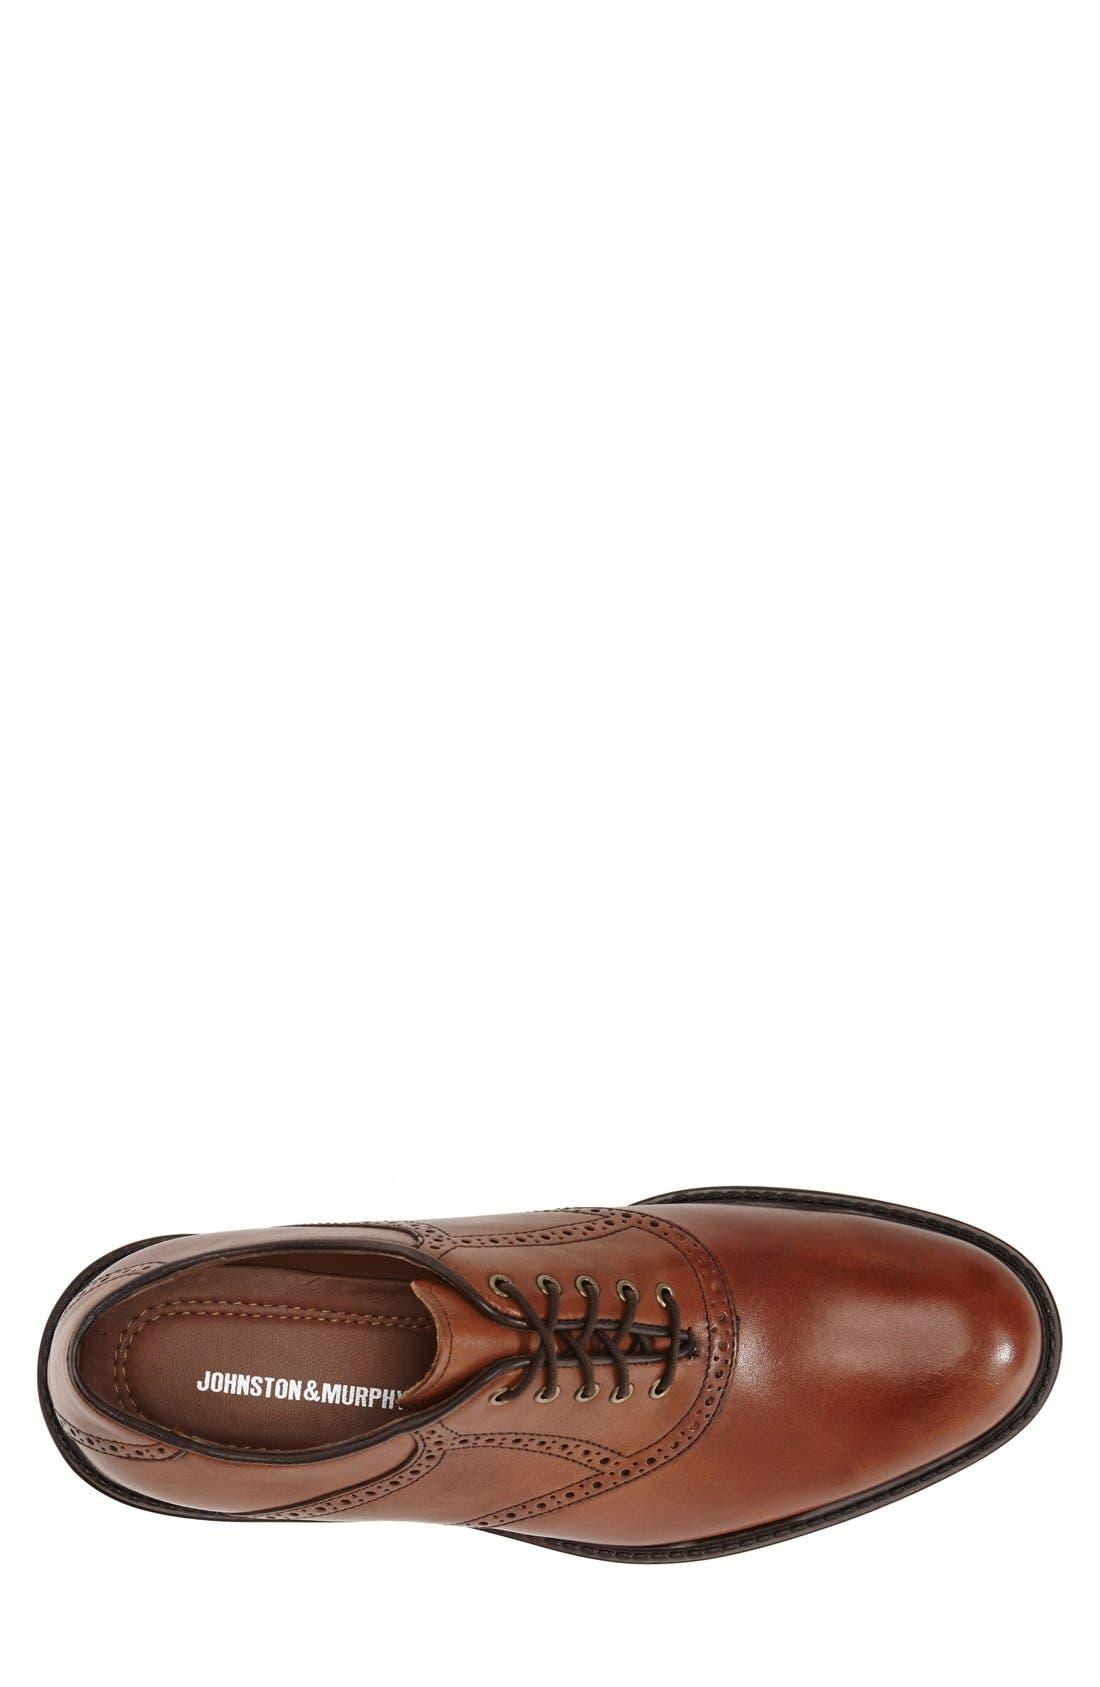 'Tabor' Saddle Shoe,                             Alternate thumbnail 3, color,                             MAHOGANY